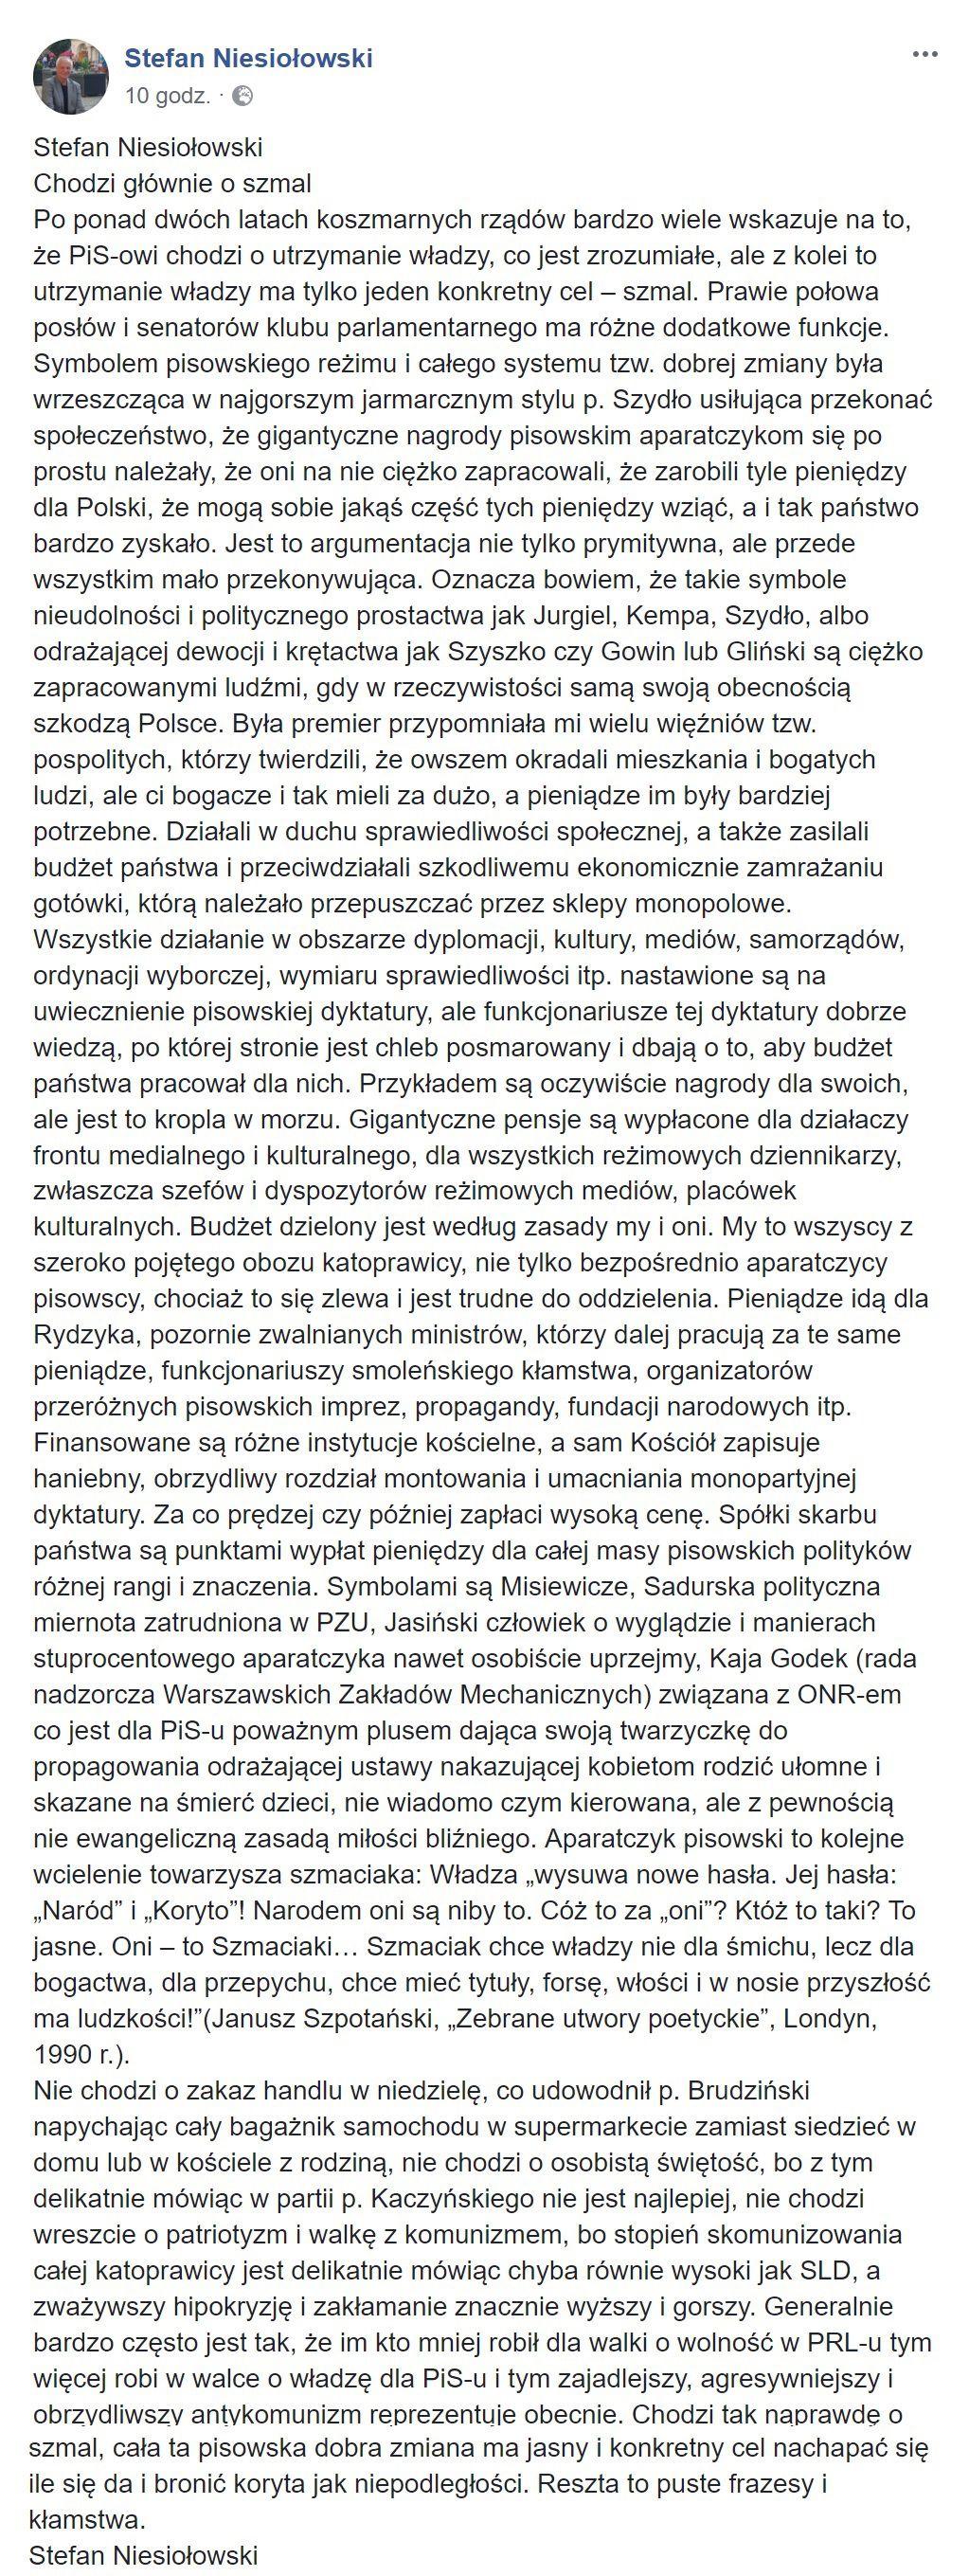 Niesiołowski